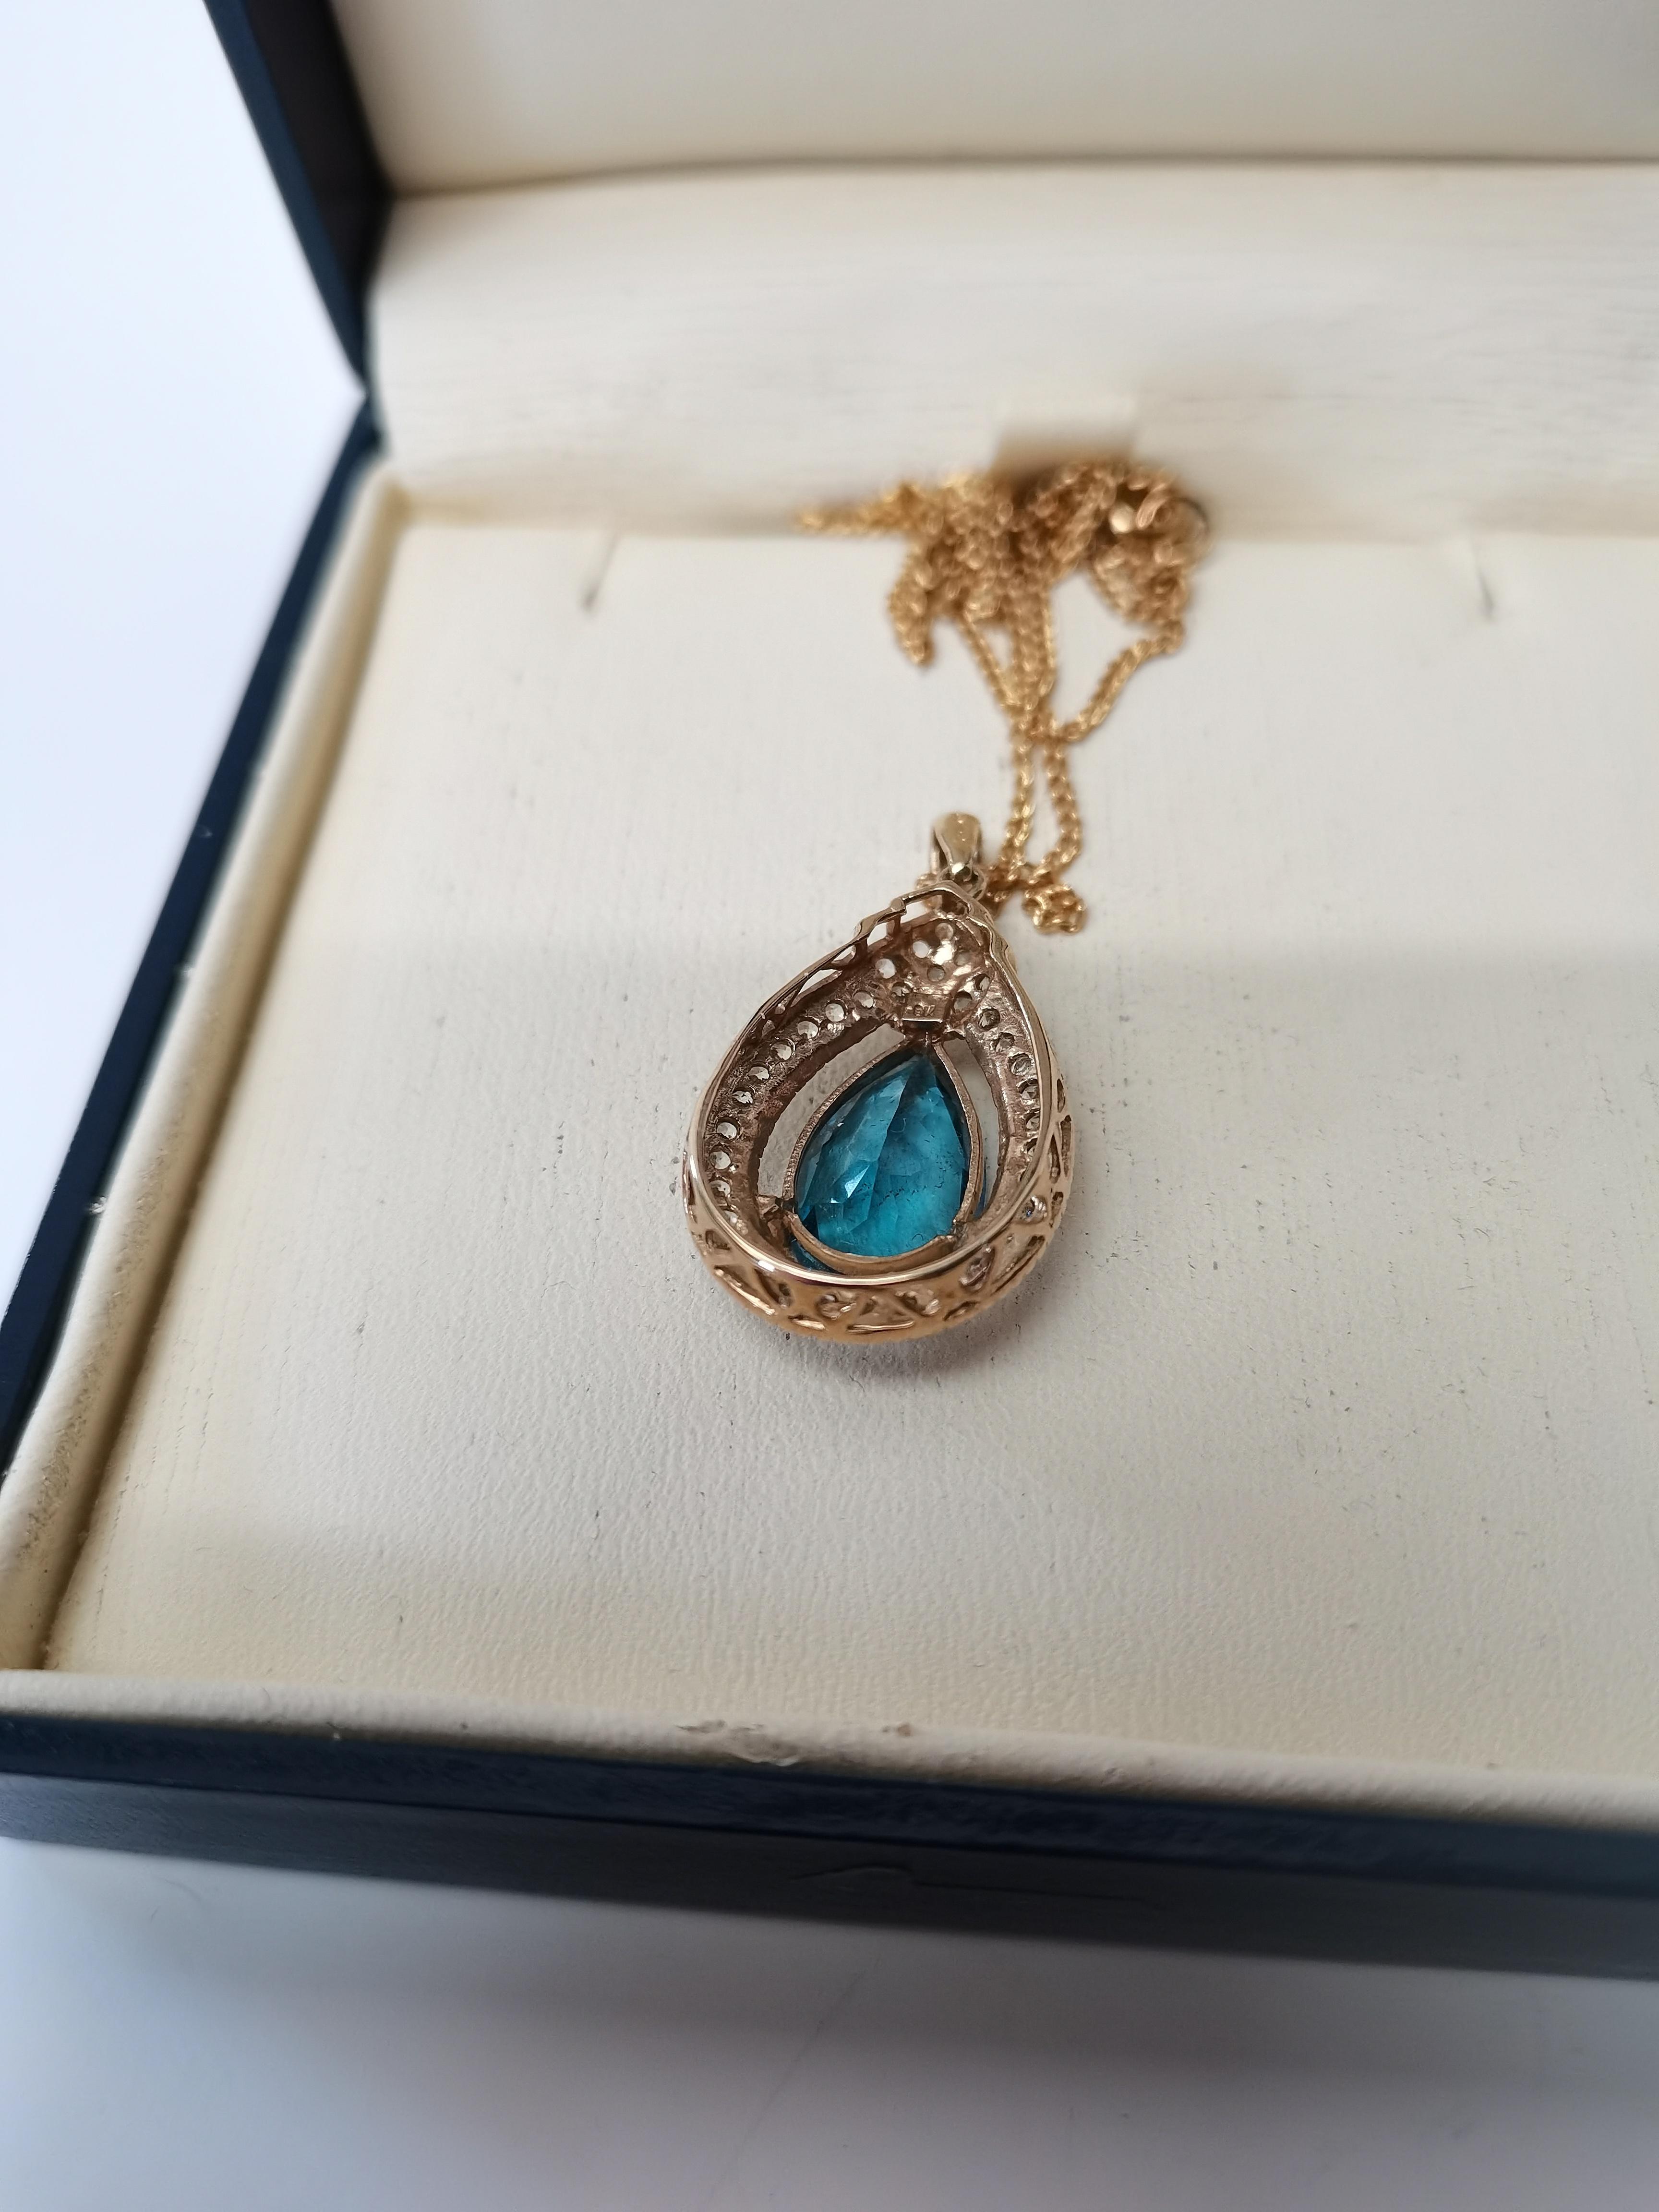 Blue topaz necklace - Image 3 of 3